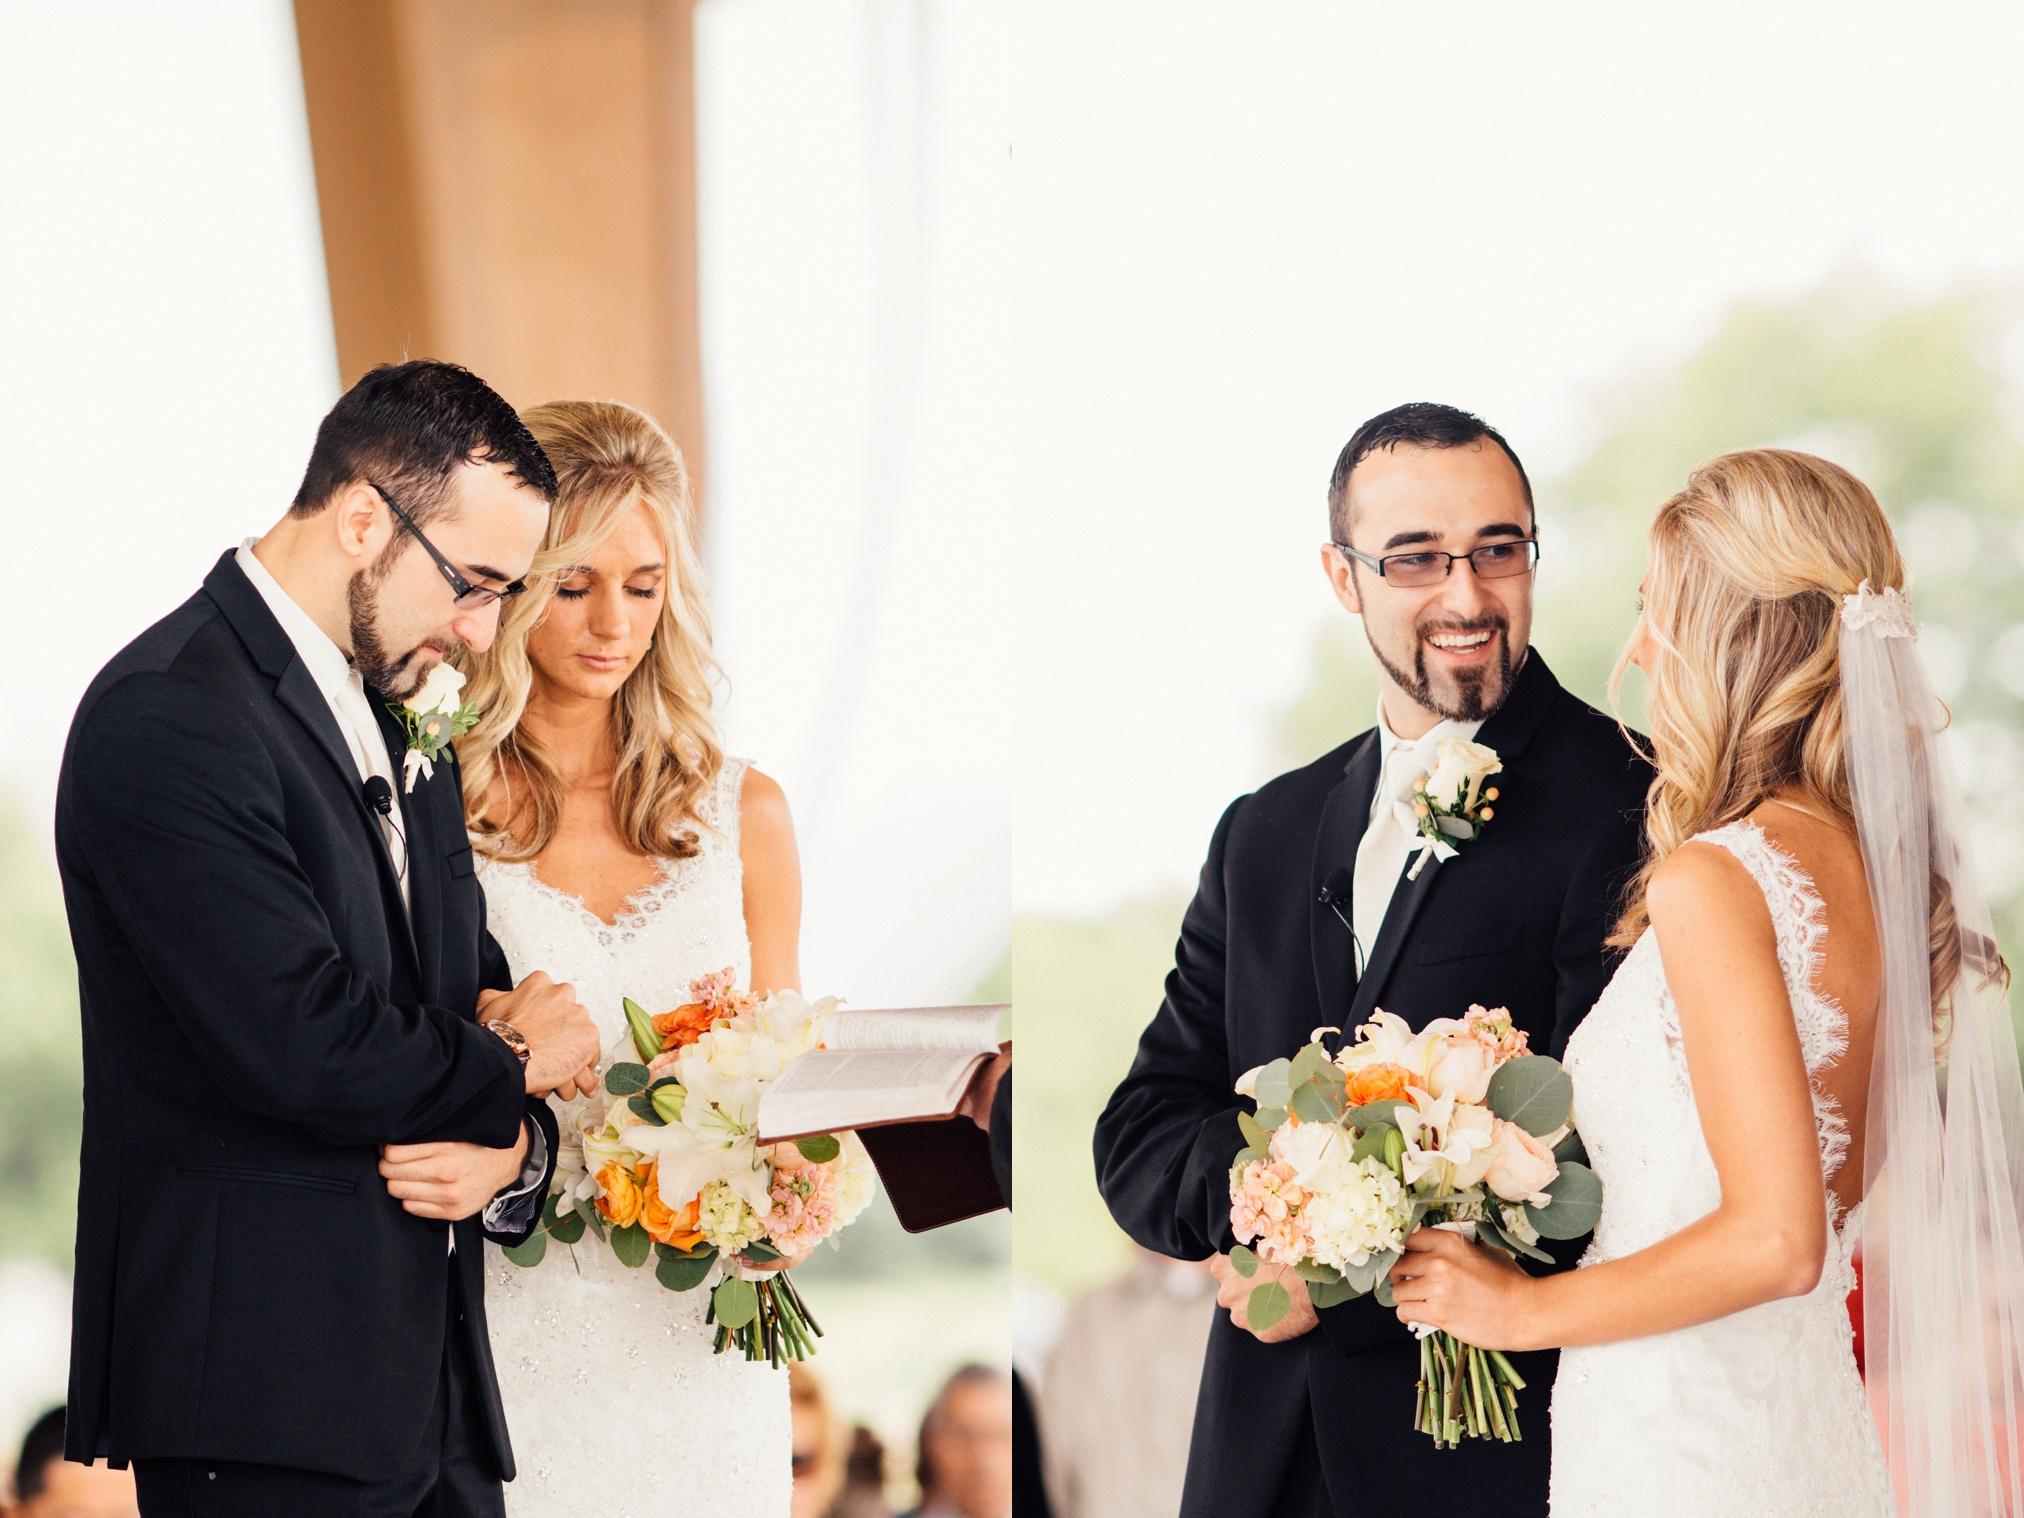 schmid_wedding-417.jpg